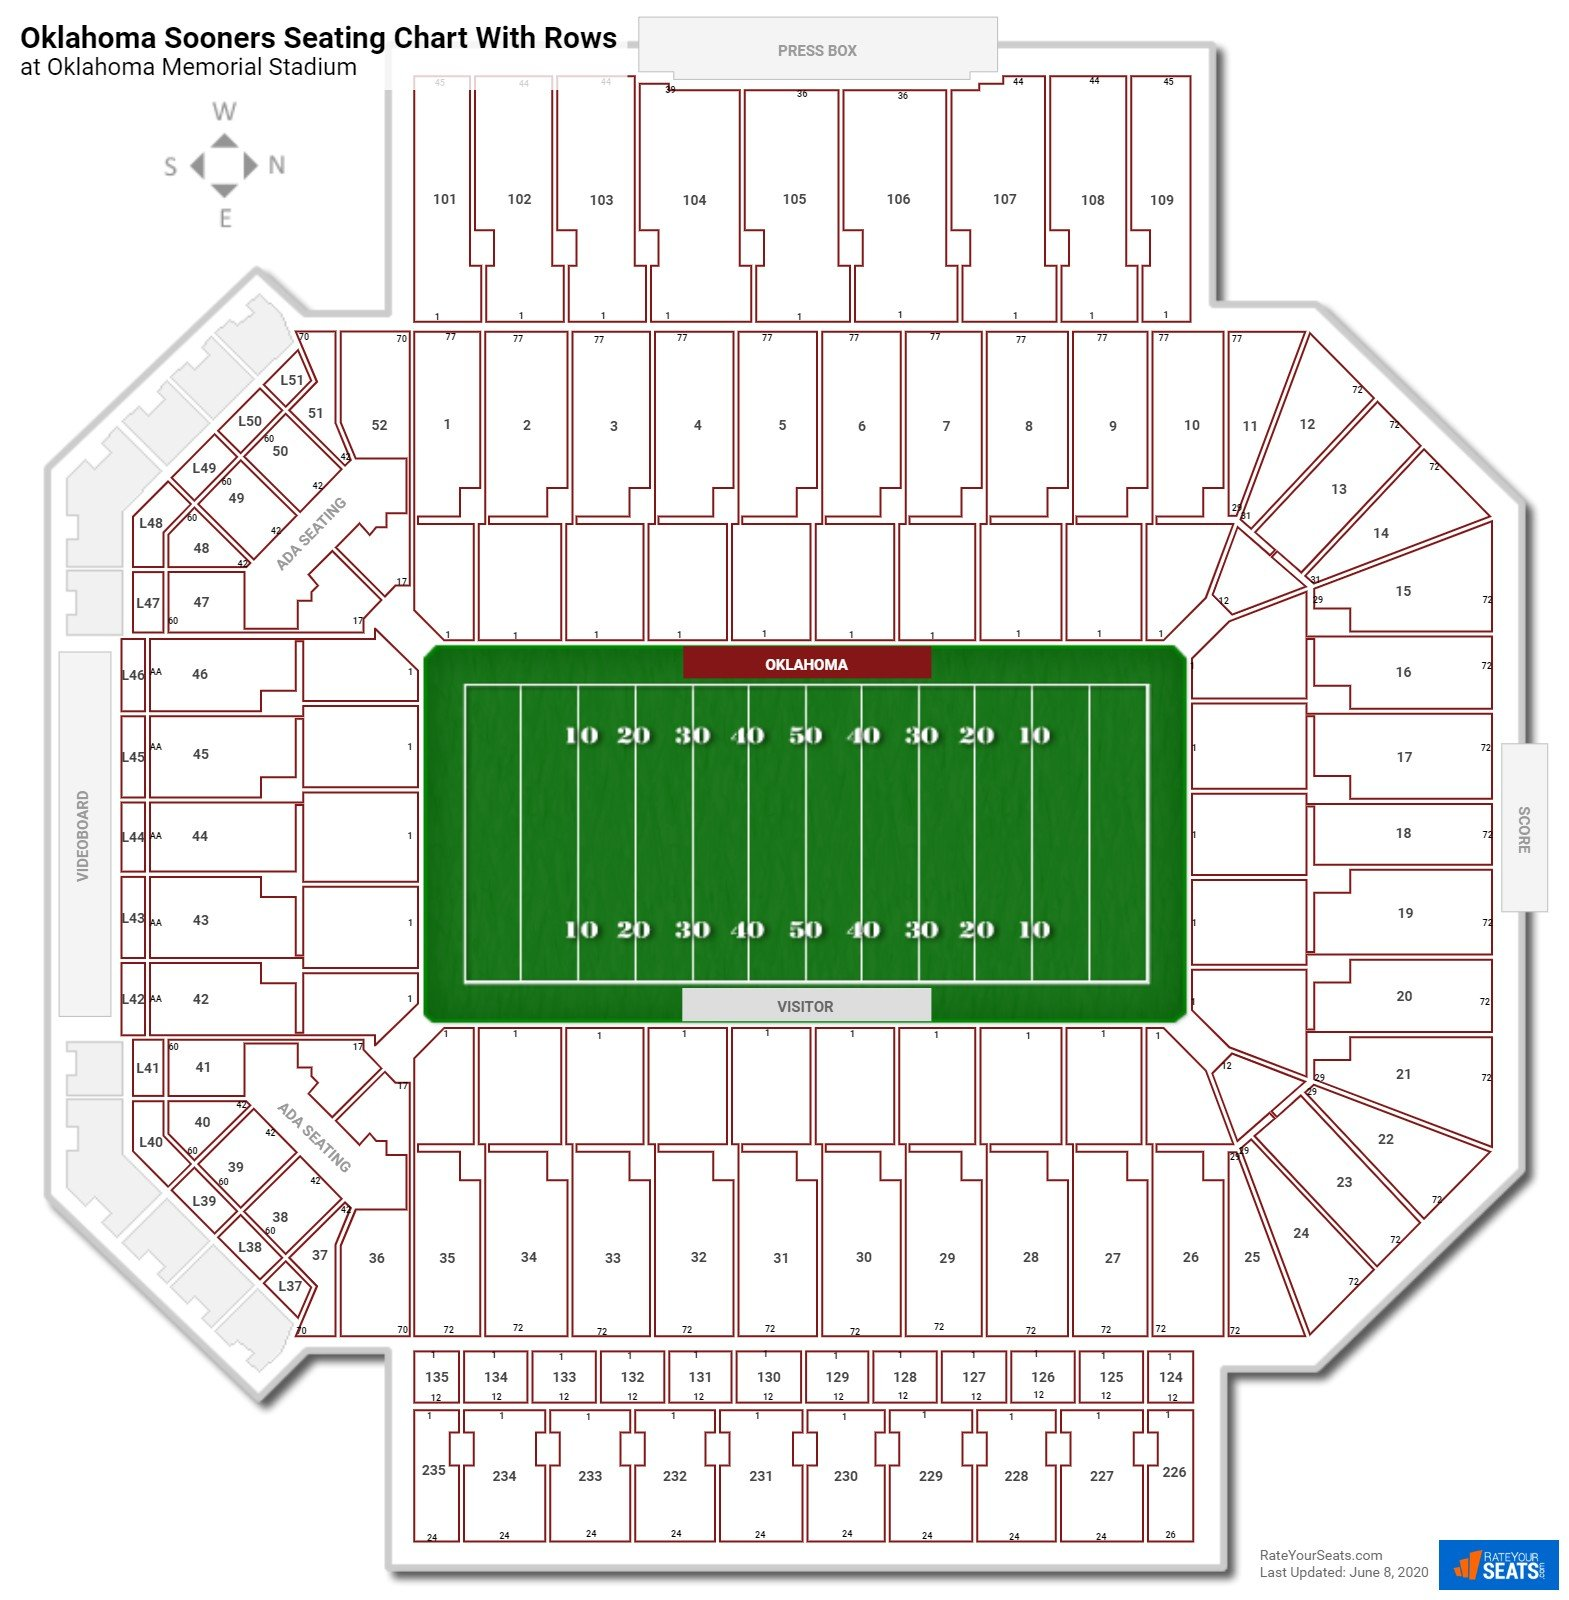 Oklahoma Memorial Stadium Seating Charts Rateyourseats Com